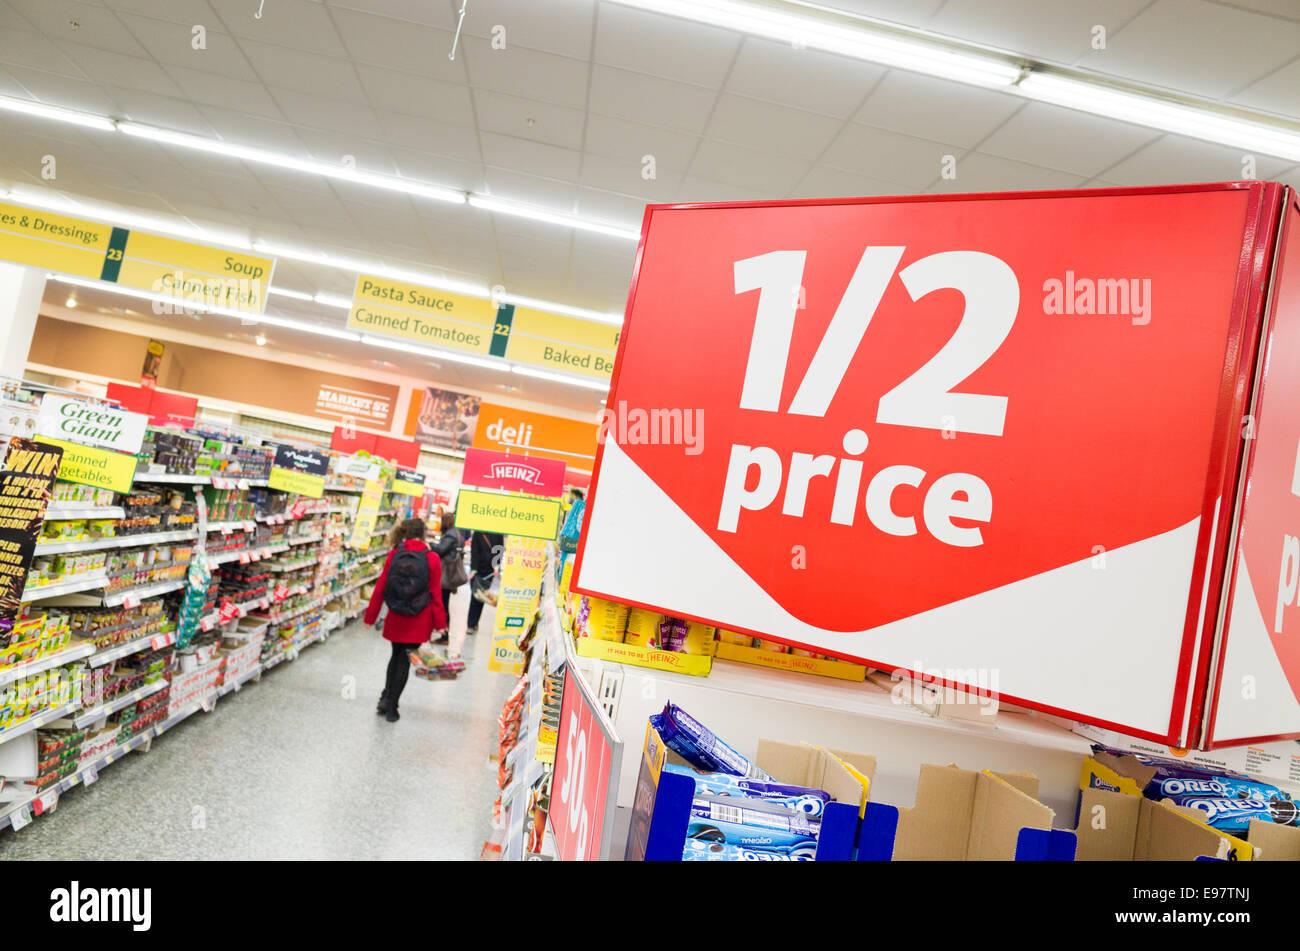 Half price sign in Morrisons supermarket, London, England, UK - Stock Image